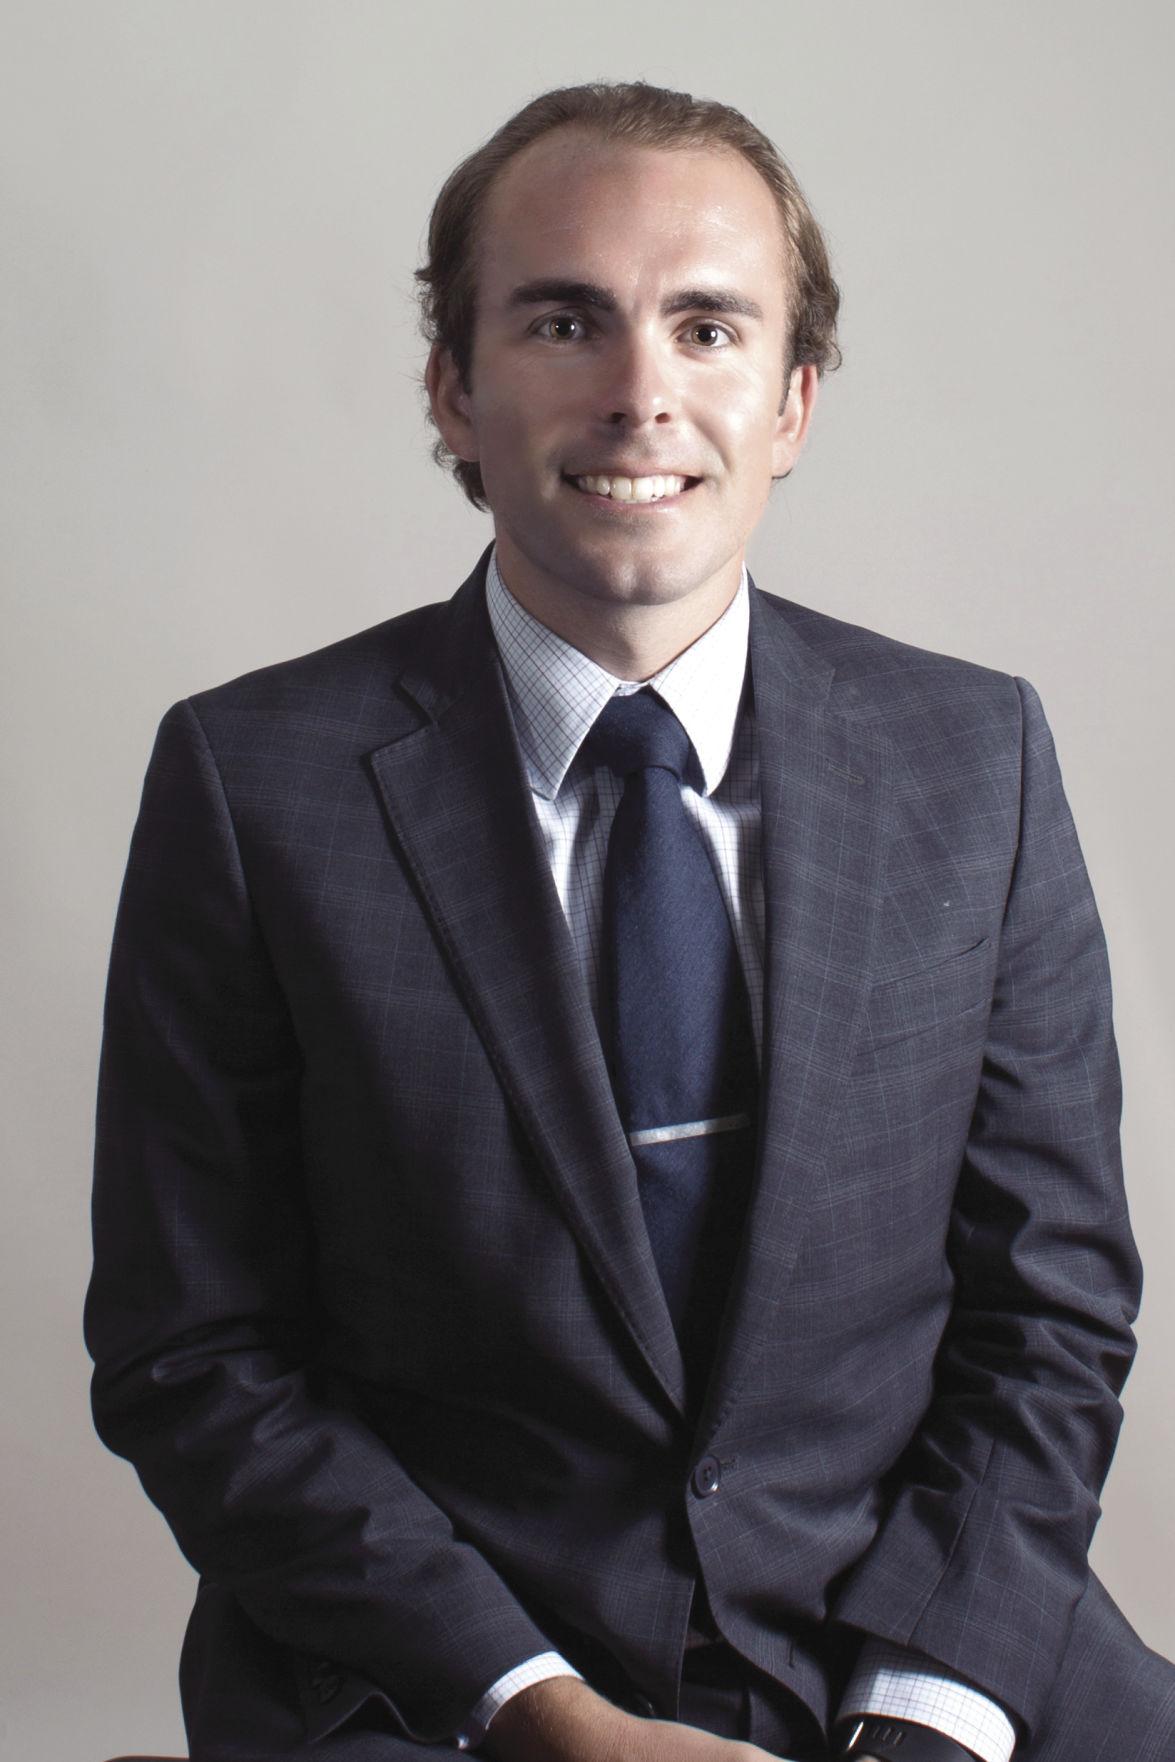 Christopher McKay